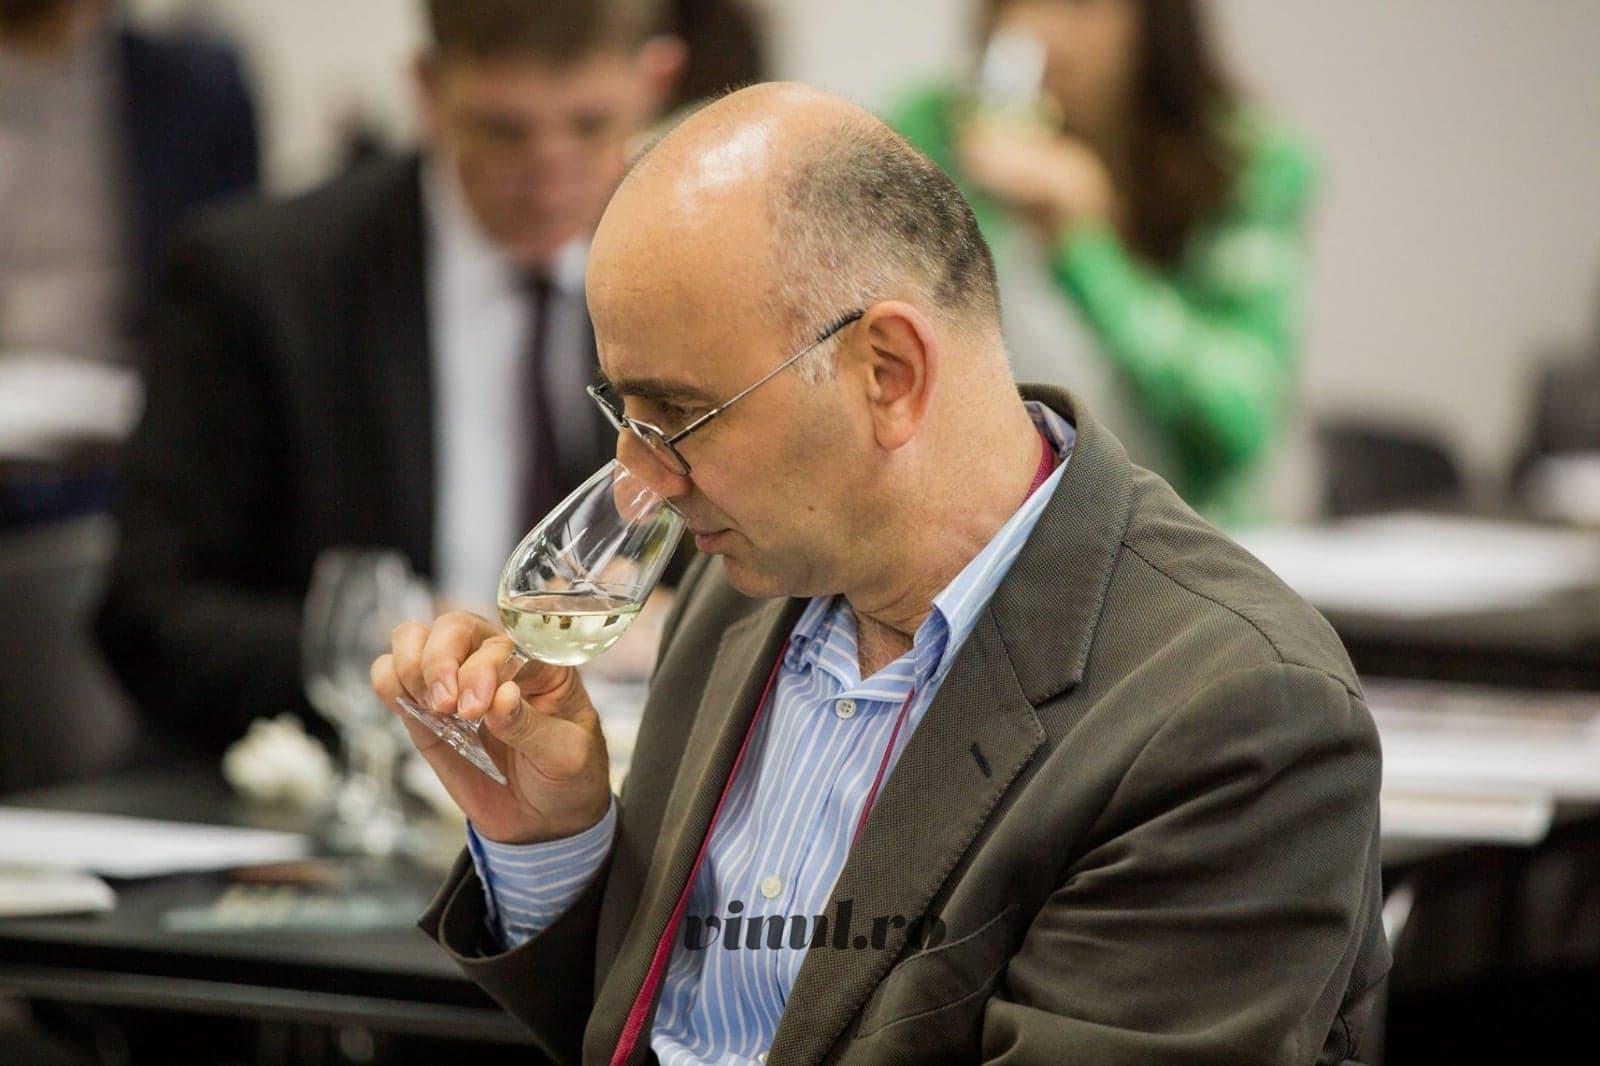 vinuri efervescente